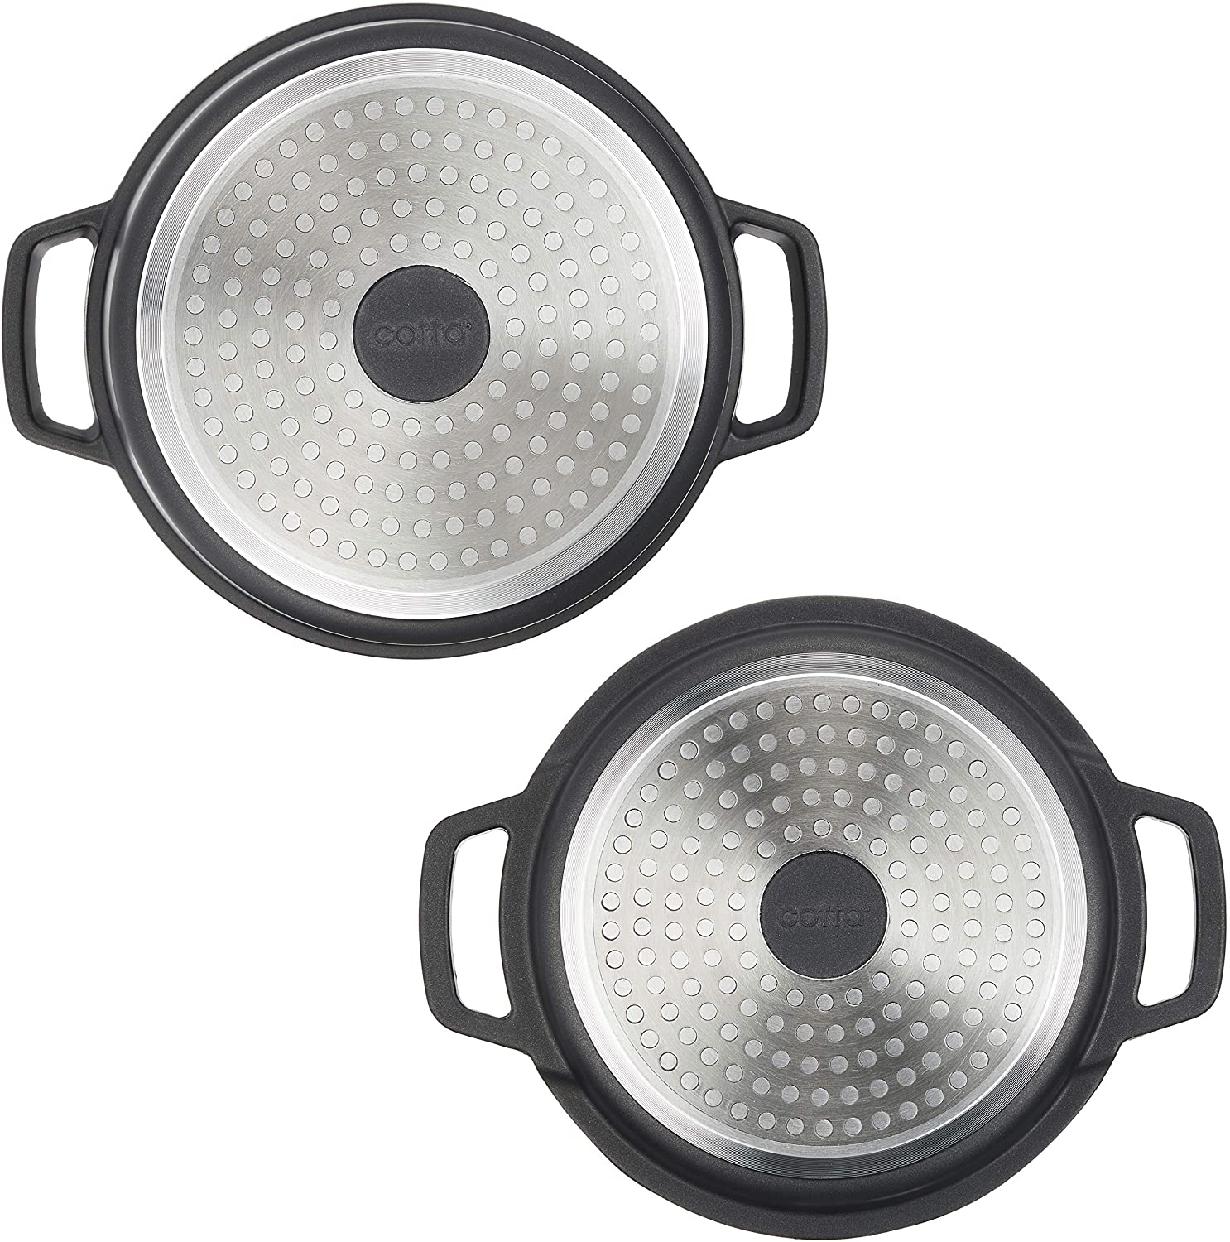 cotta(コッタ) 無水調理鍋 20cmの商品画像5